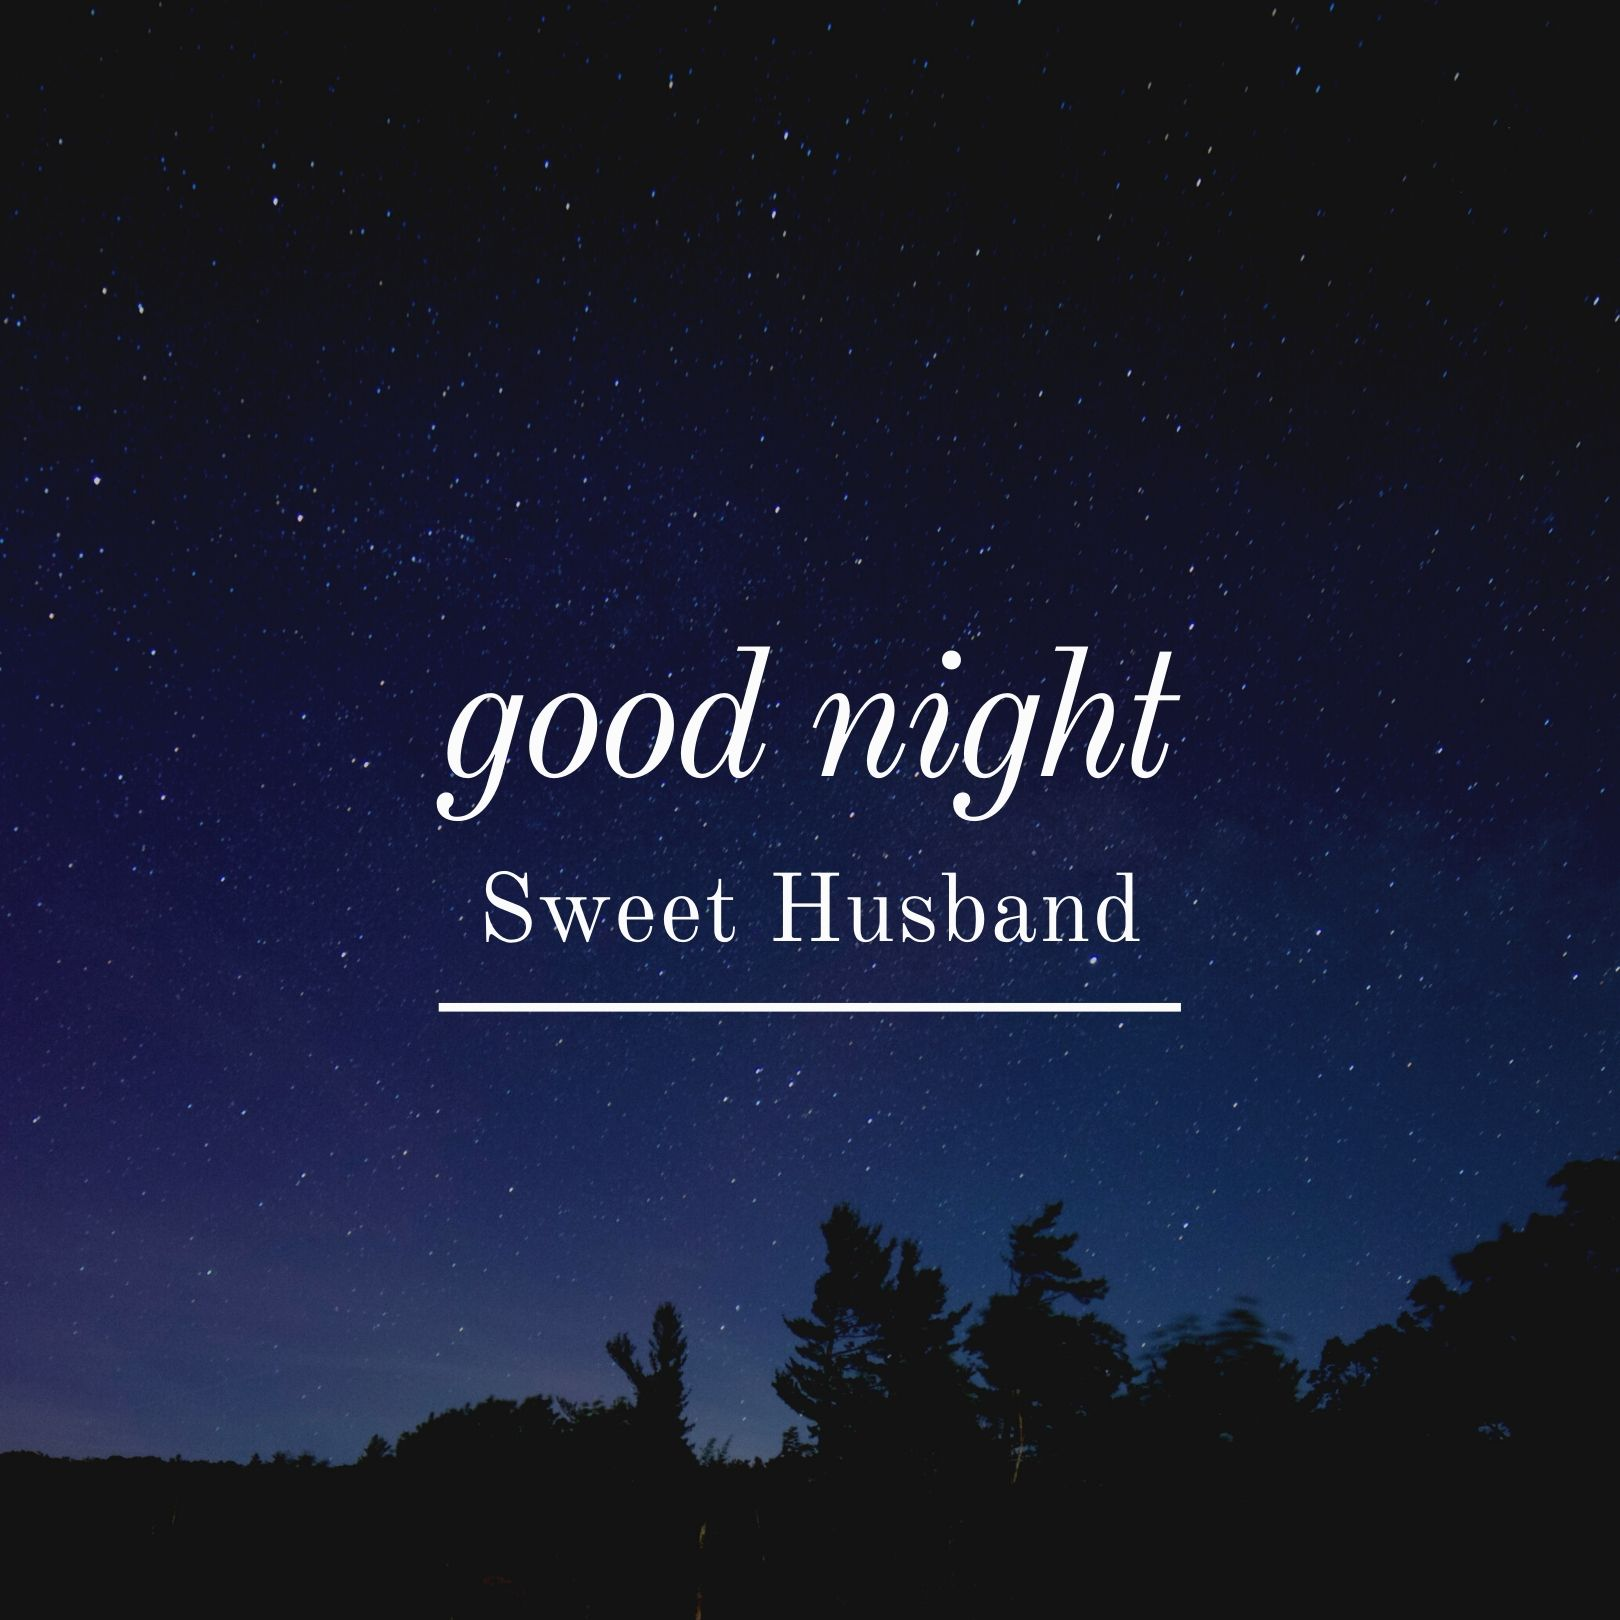 Good Night Sweet Husband full HD free download.